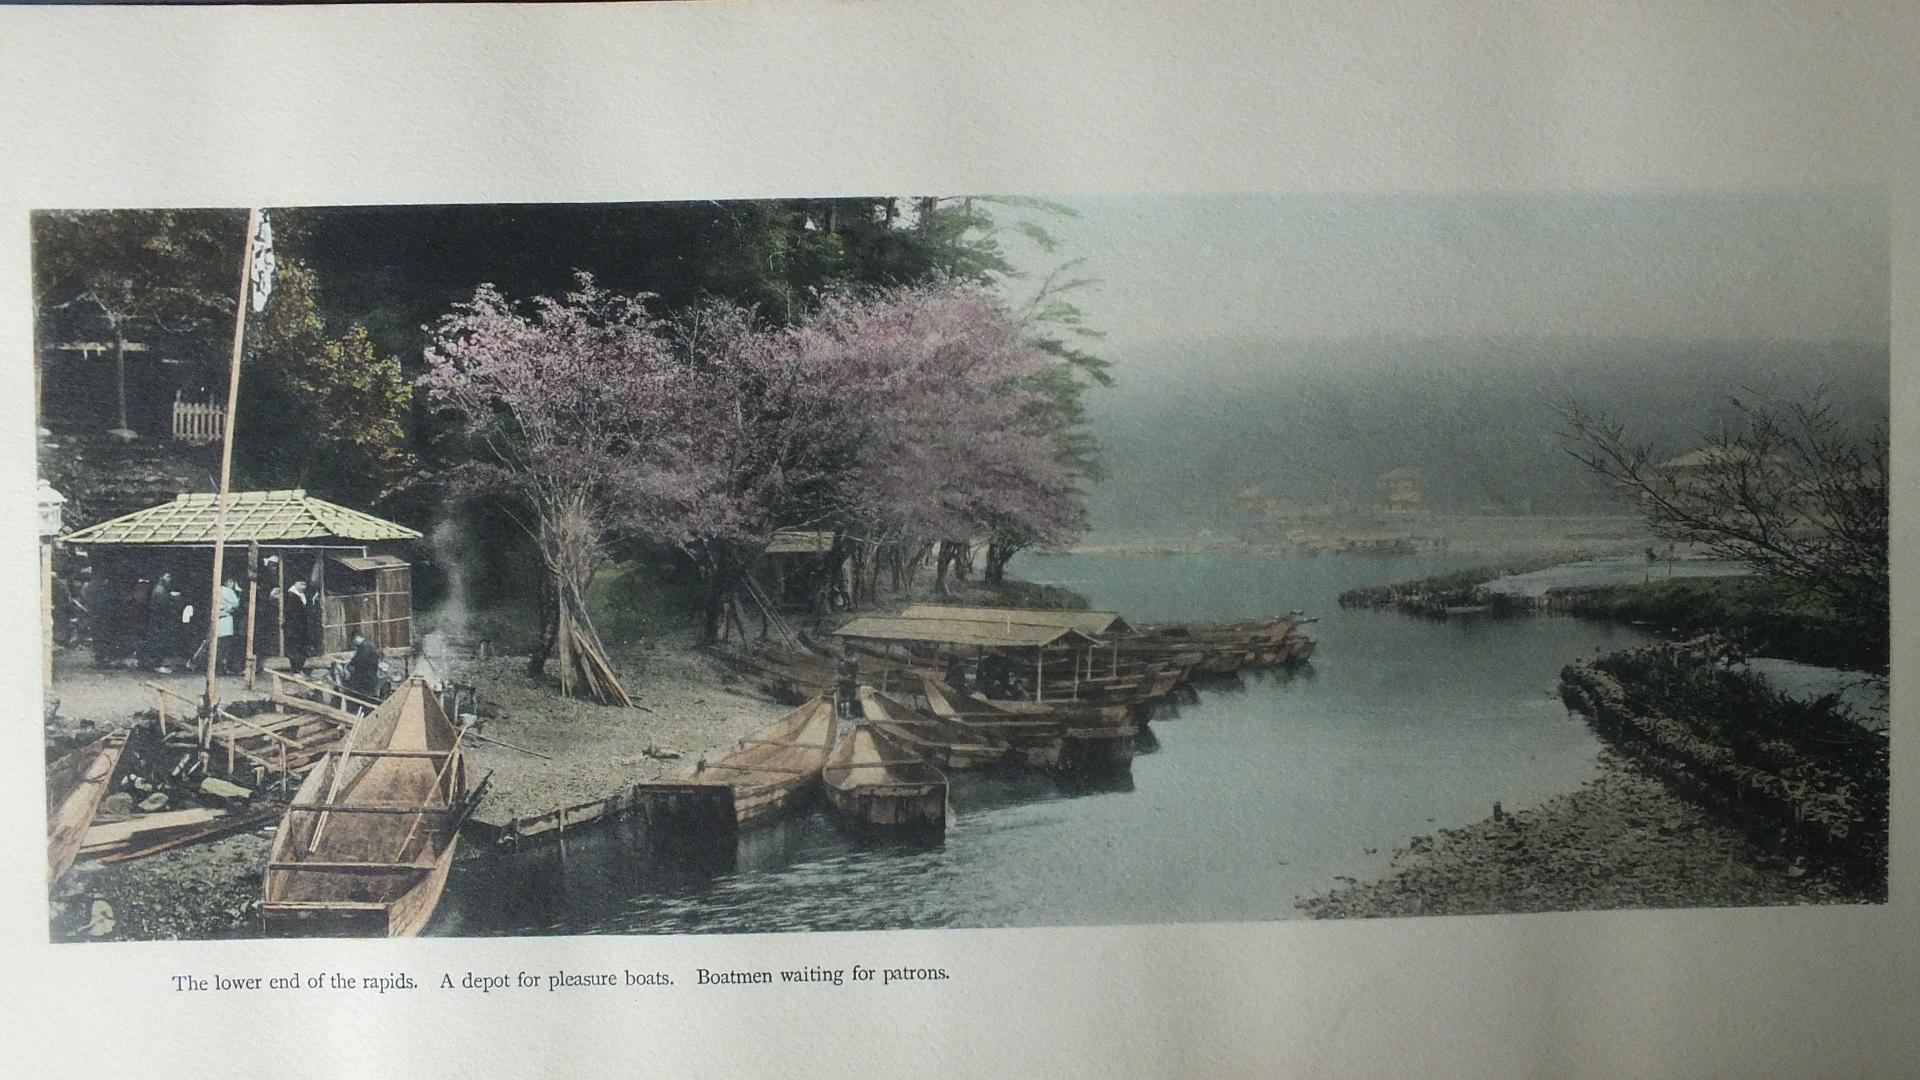 Lot 268 - Kozaburo Tamamura (1856-1953), Characteristic Japan, Views and Characters in the Land of the